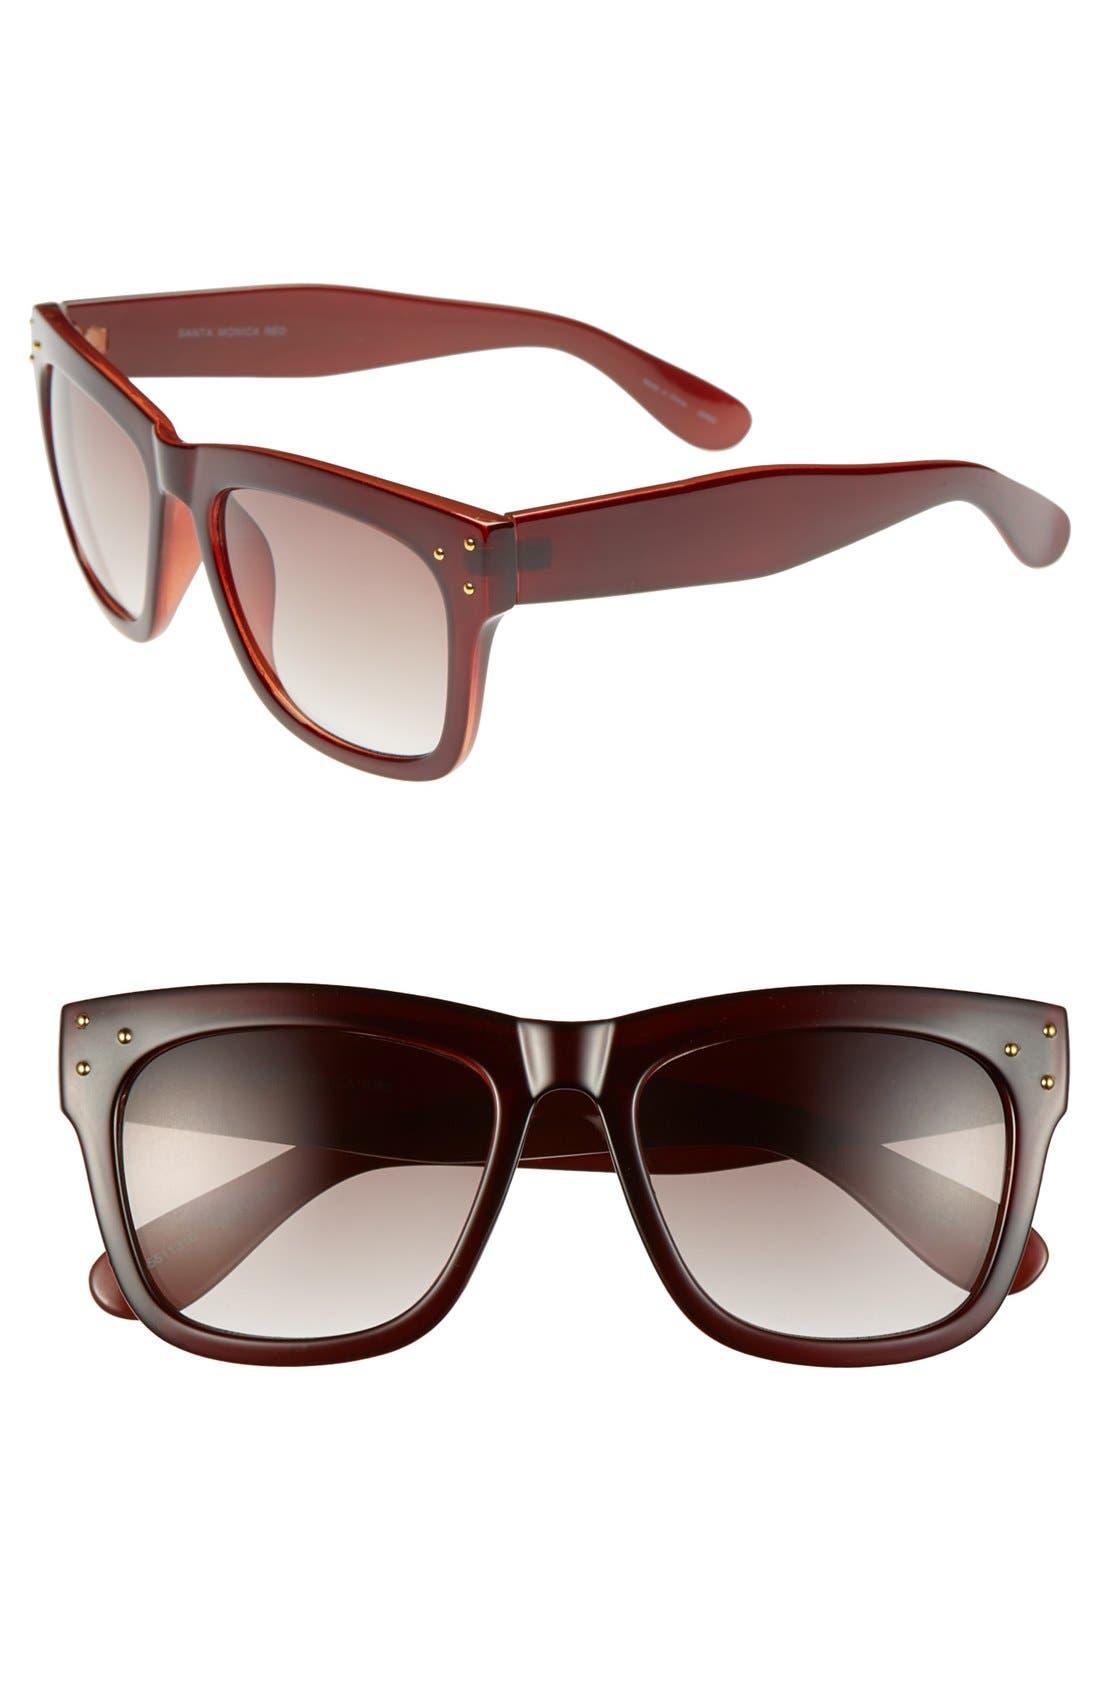 Alternate Image 1 Selected - Outlook Eyewear 'Santa Monica' 53mm Sunglasses